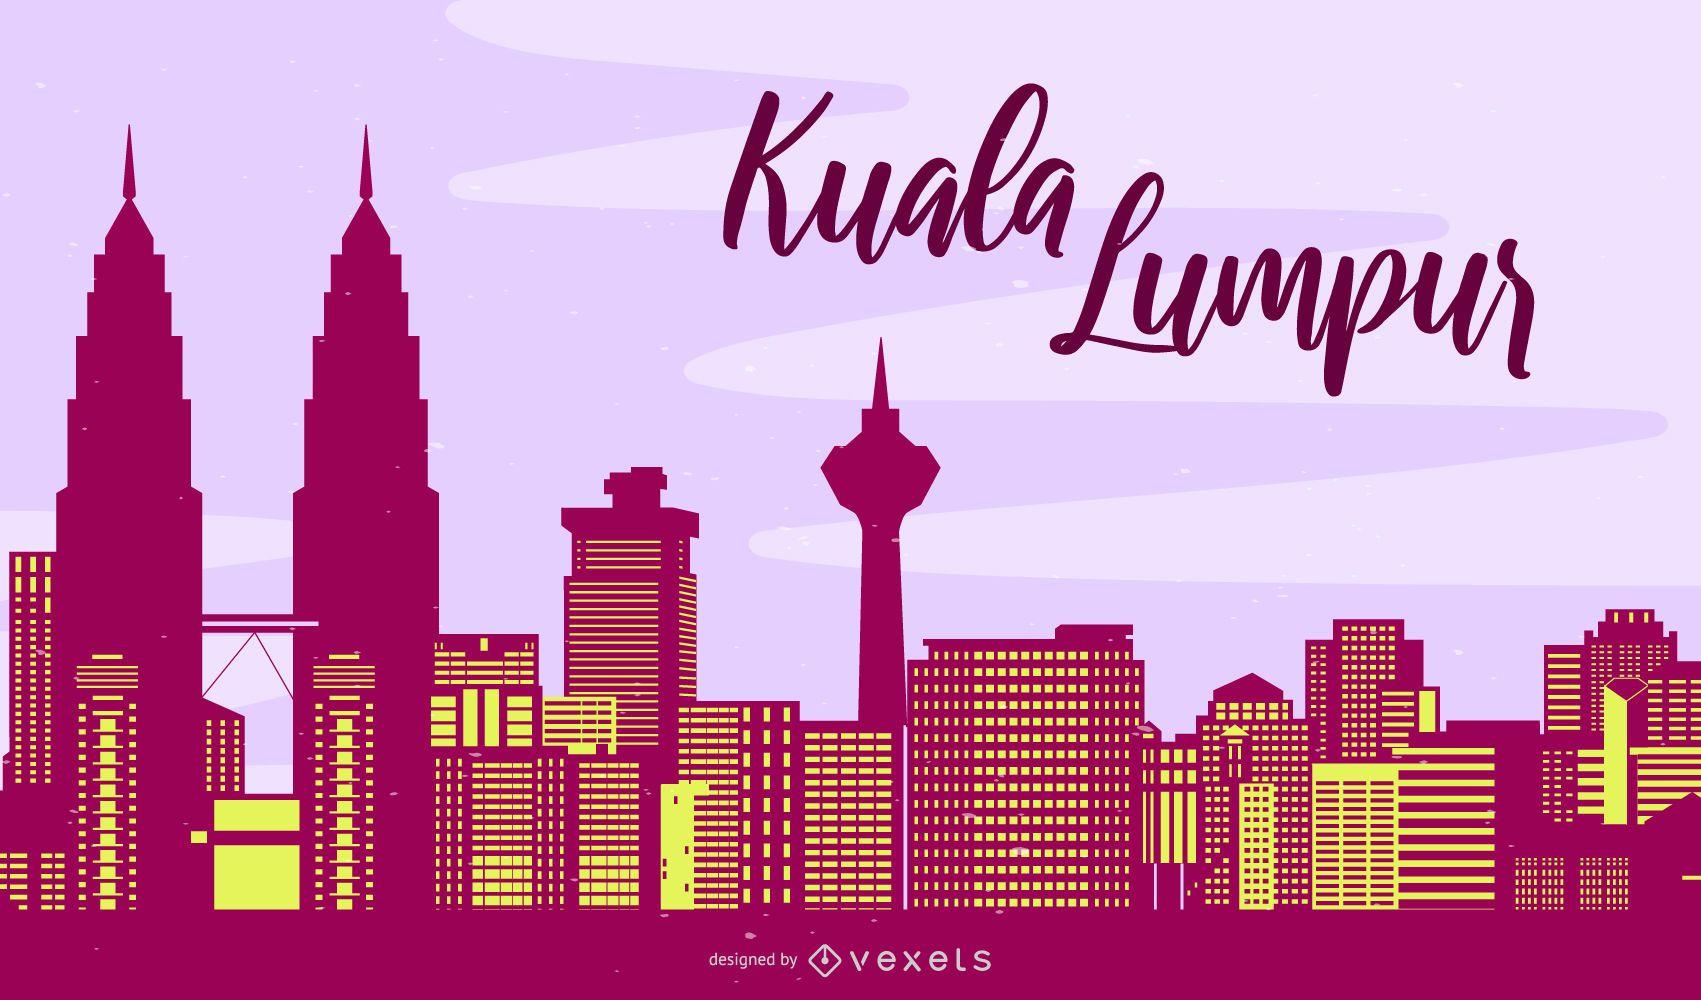 Silueta del horizonte de Kuala Lumpur